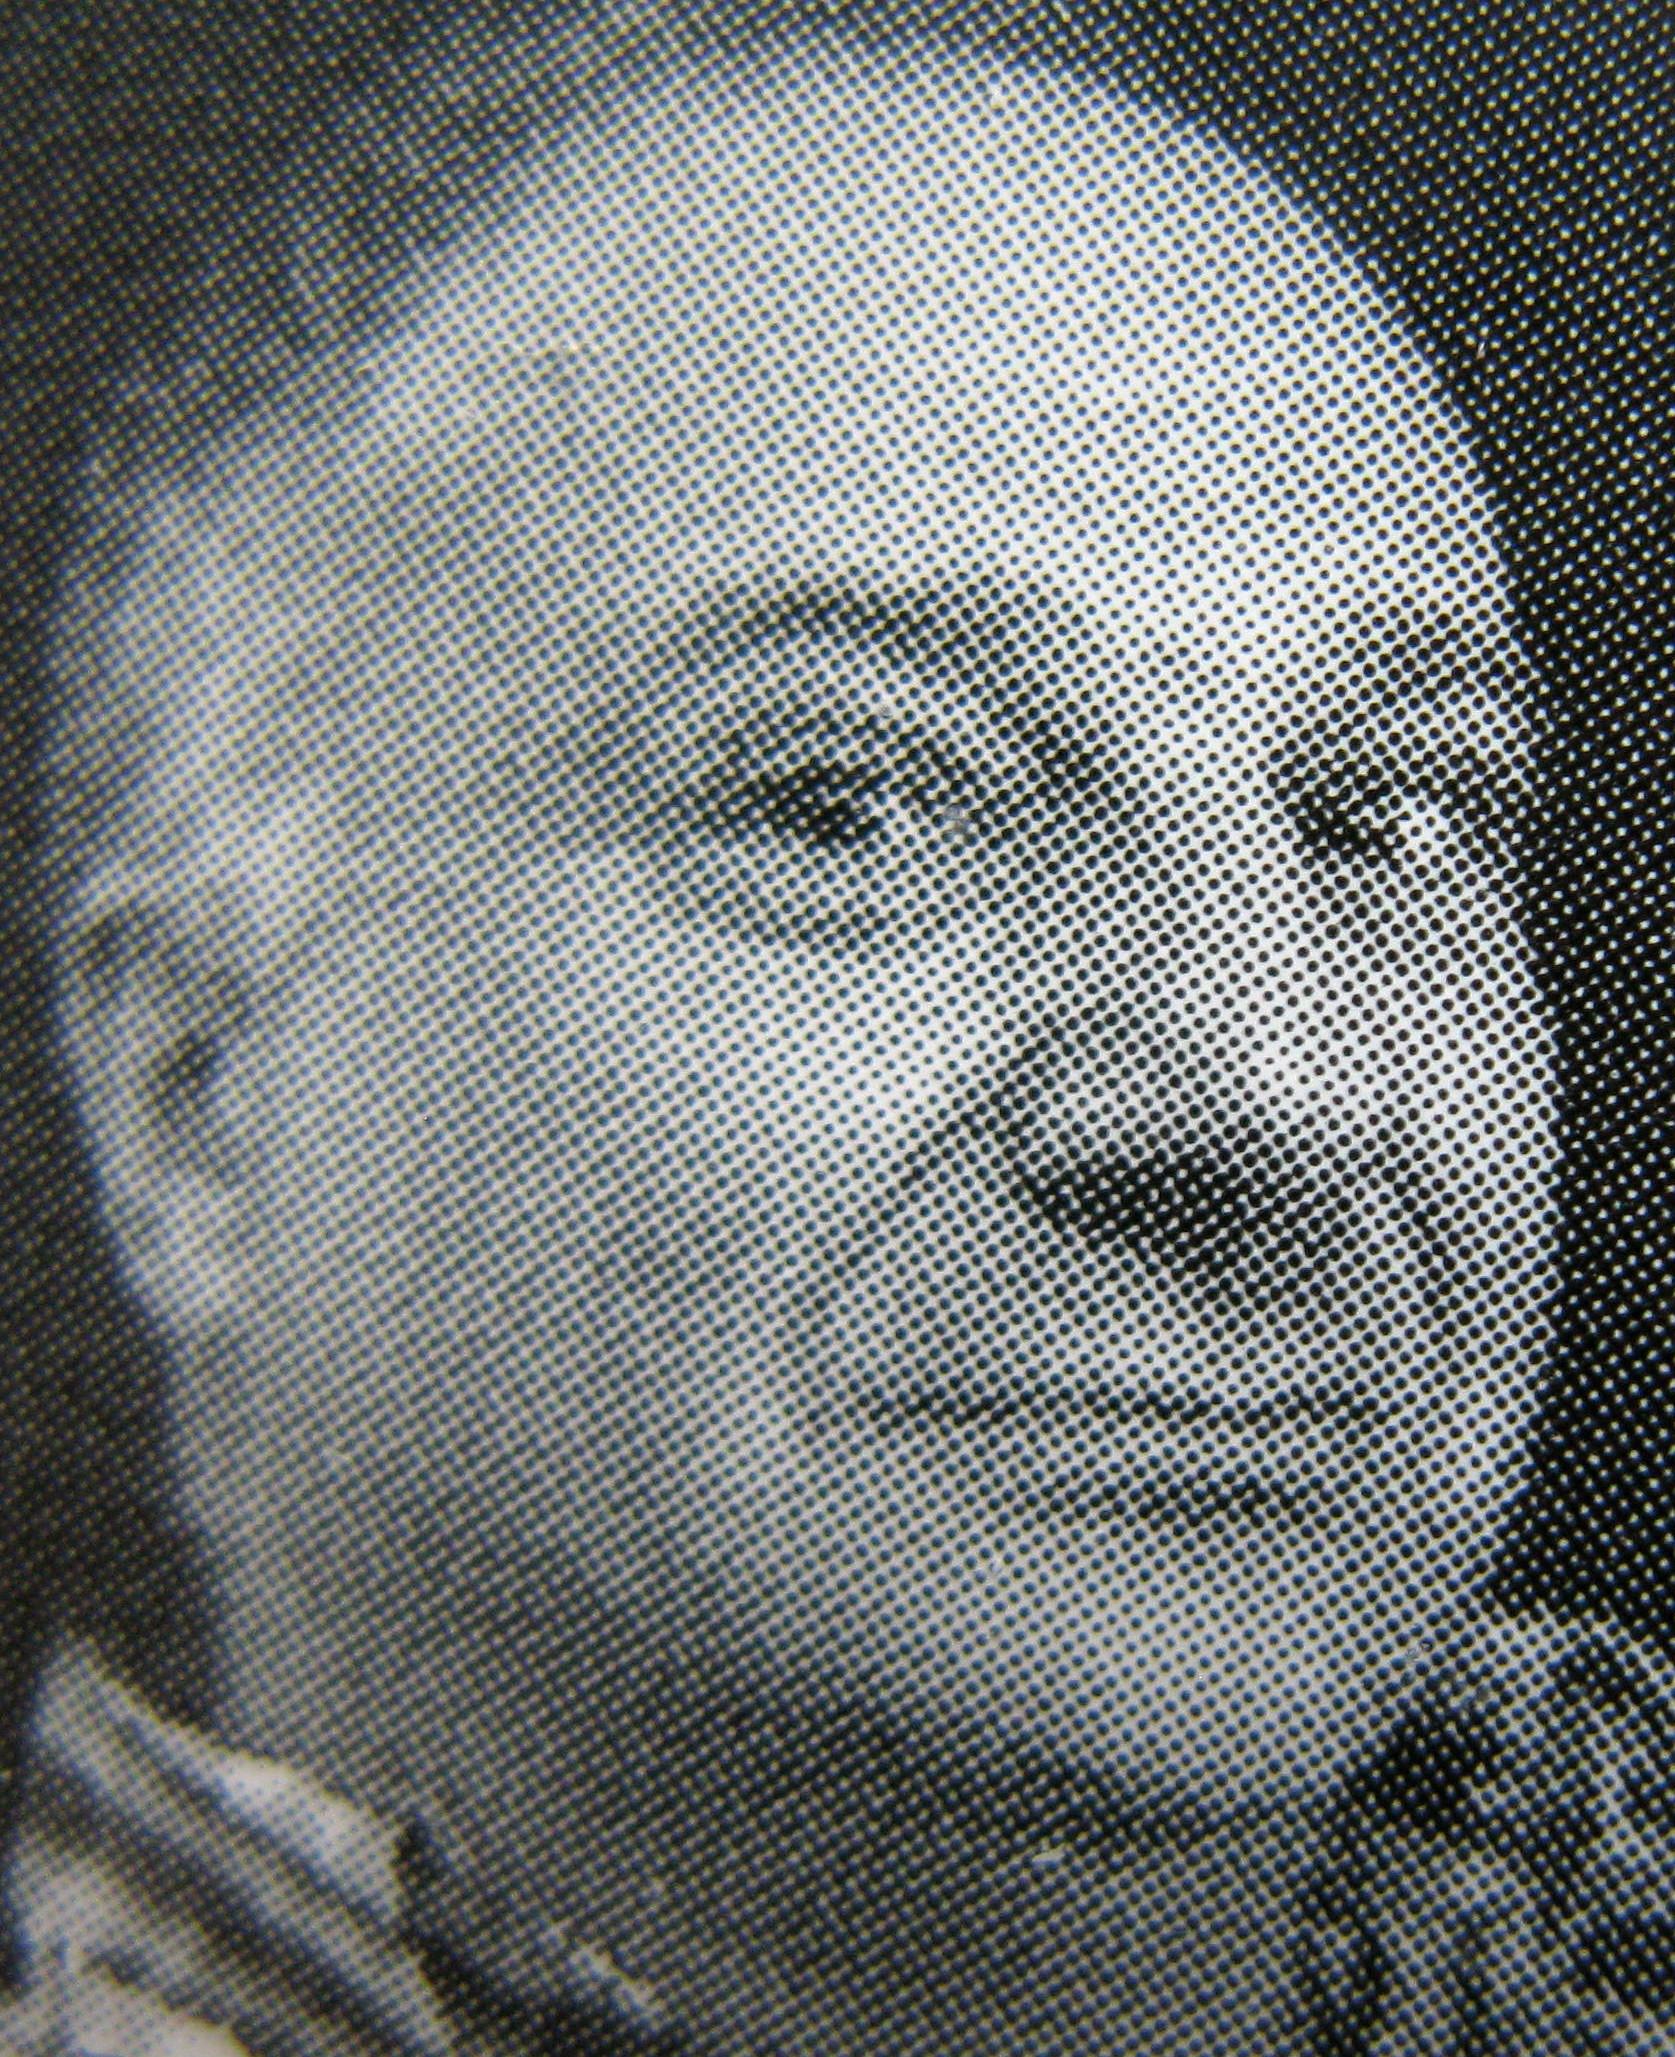 Lana Golja picture